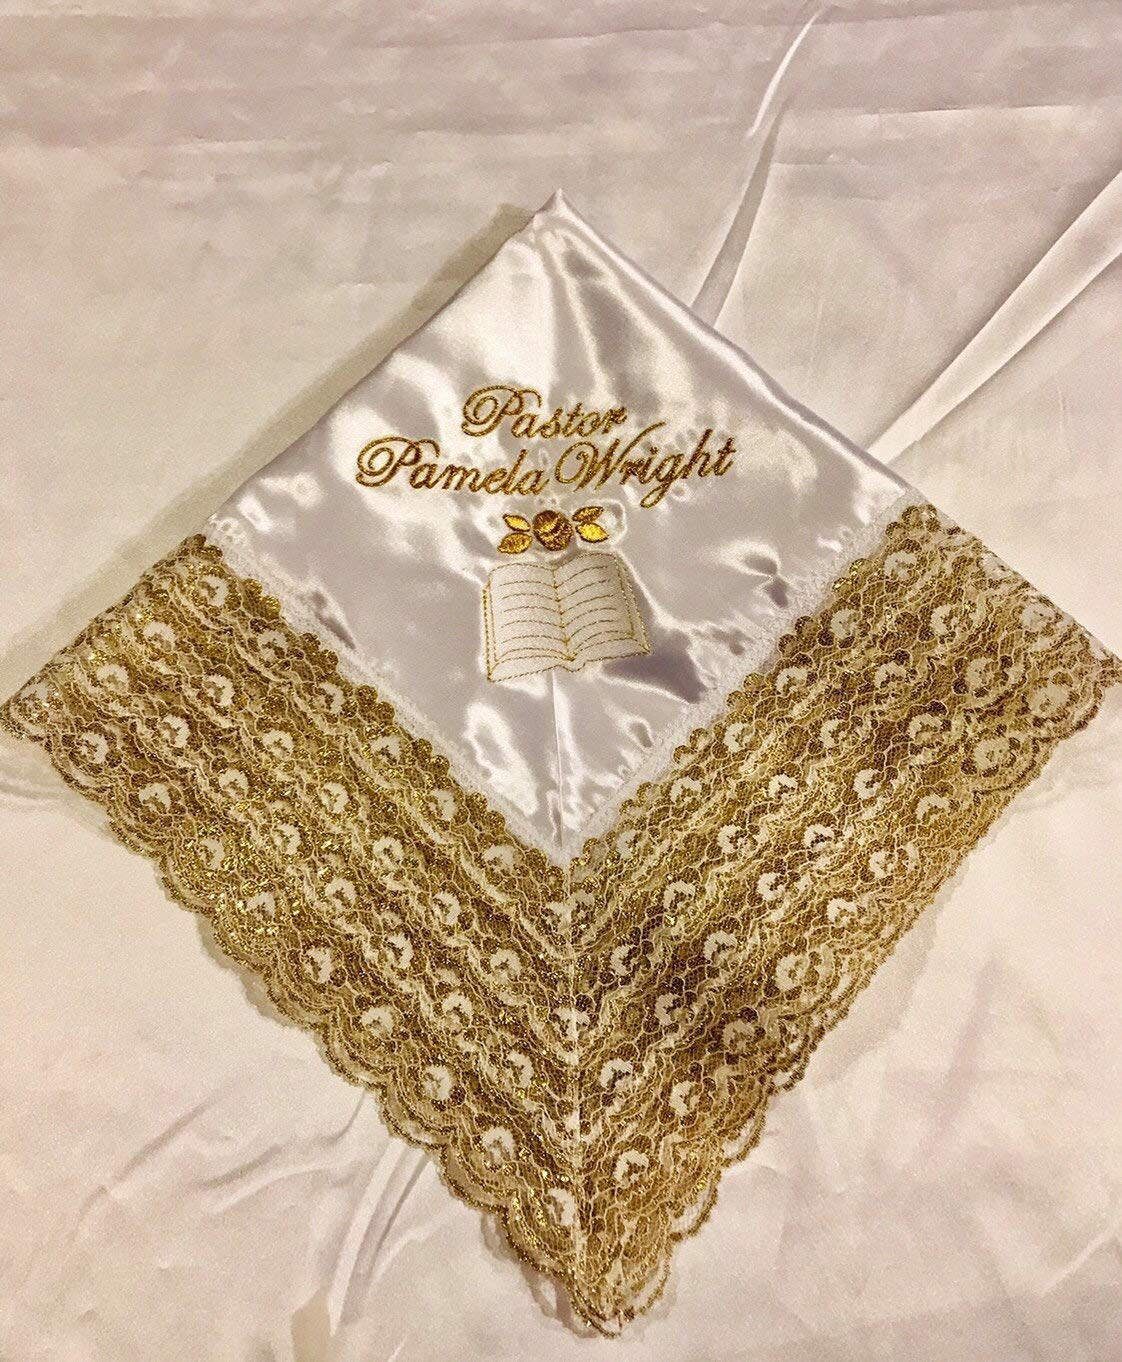 Women\u2019s Lace Handkerchief Custom Woman\u2019s Handkerchief First Lady Church Handkerchief Personalized Initial Handkerchief